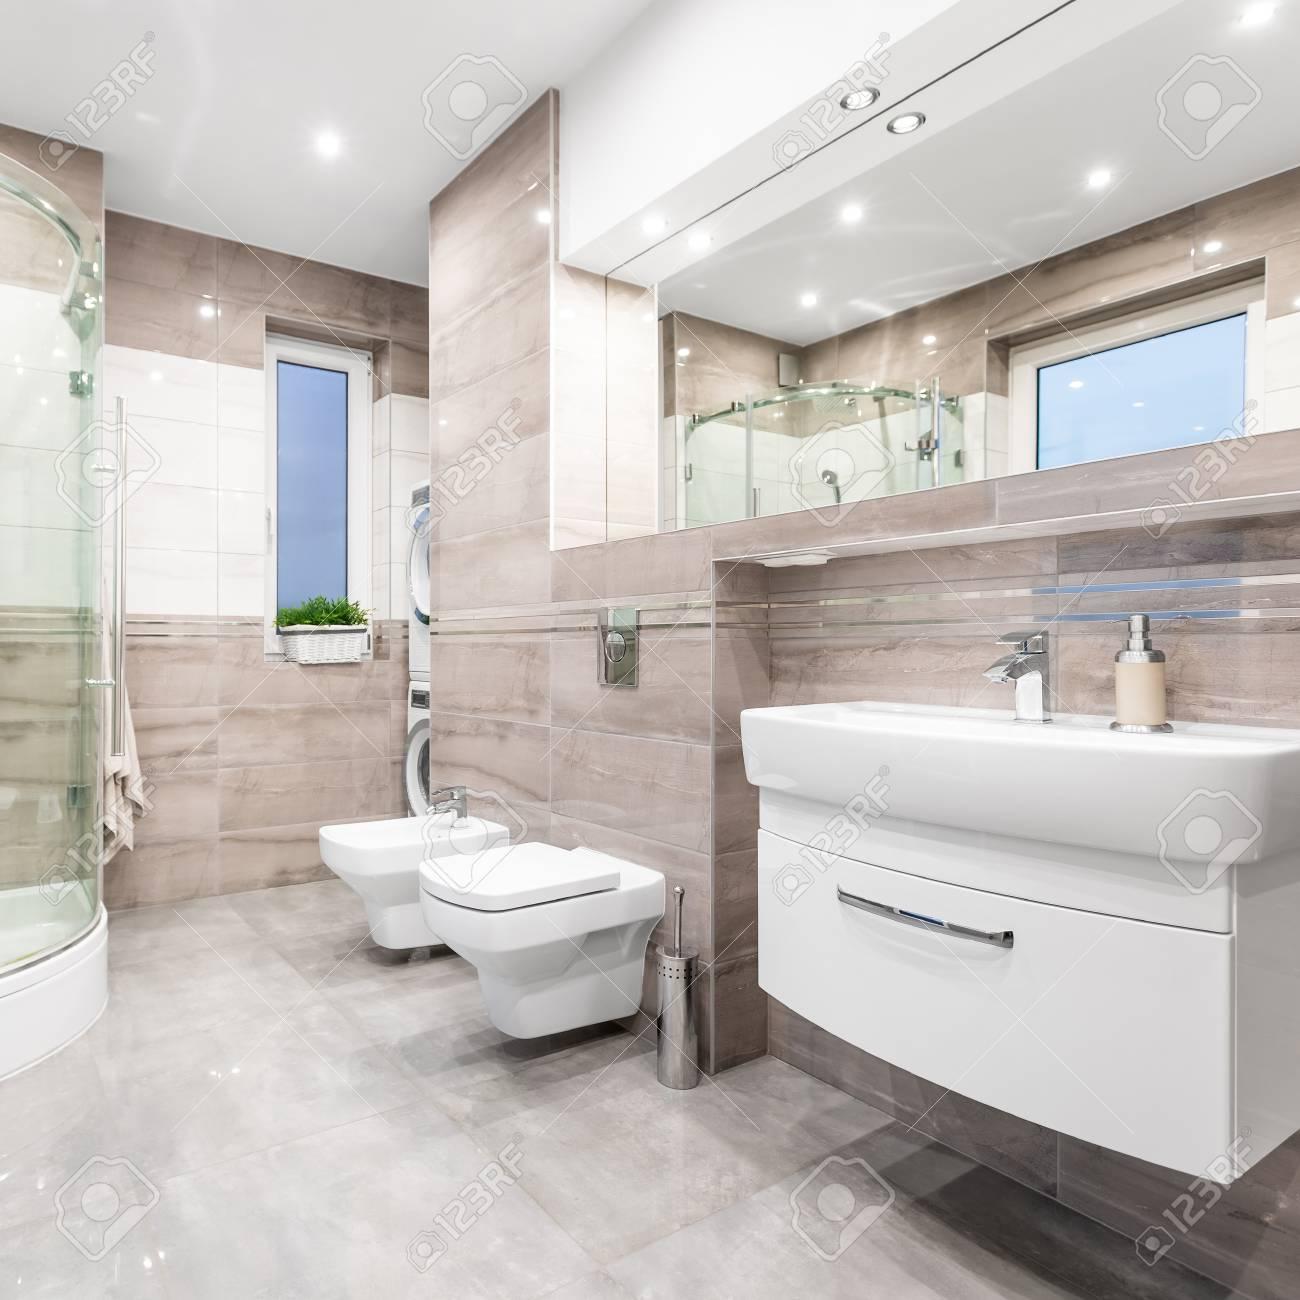 Functional Beige Bathroom With Window, Shower, Toilet, Bidet ...